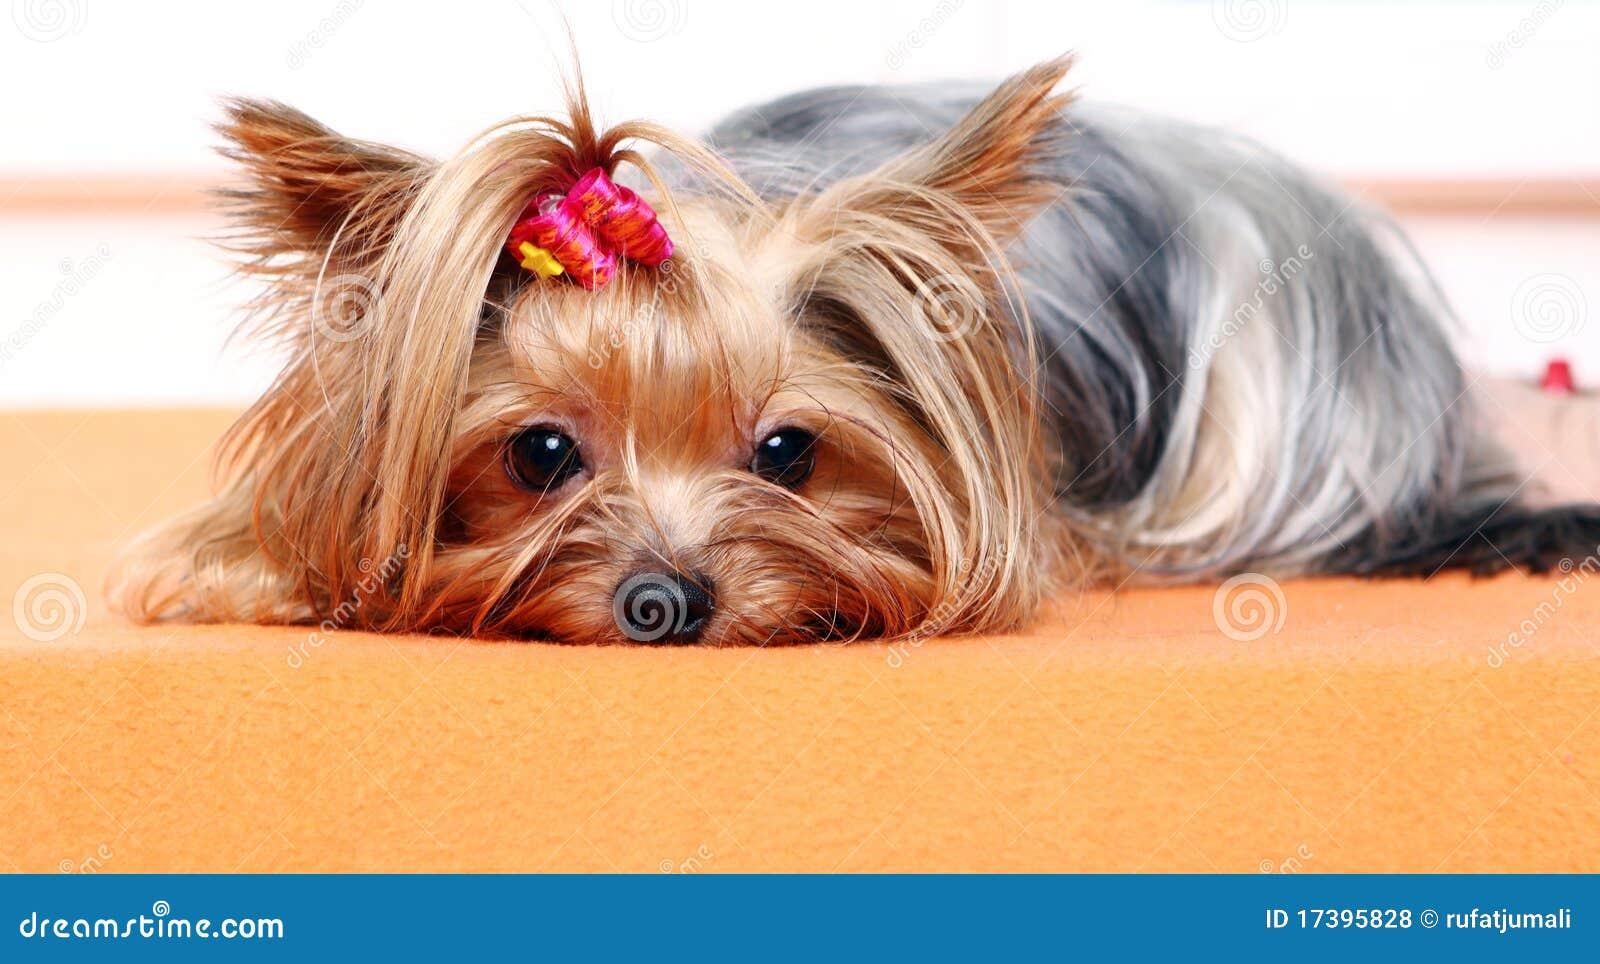 Beautiful And Cute York Terrier Dog: Beautiful And Cute York Terrier Dog Stock Photo